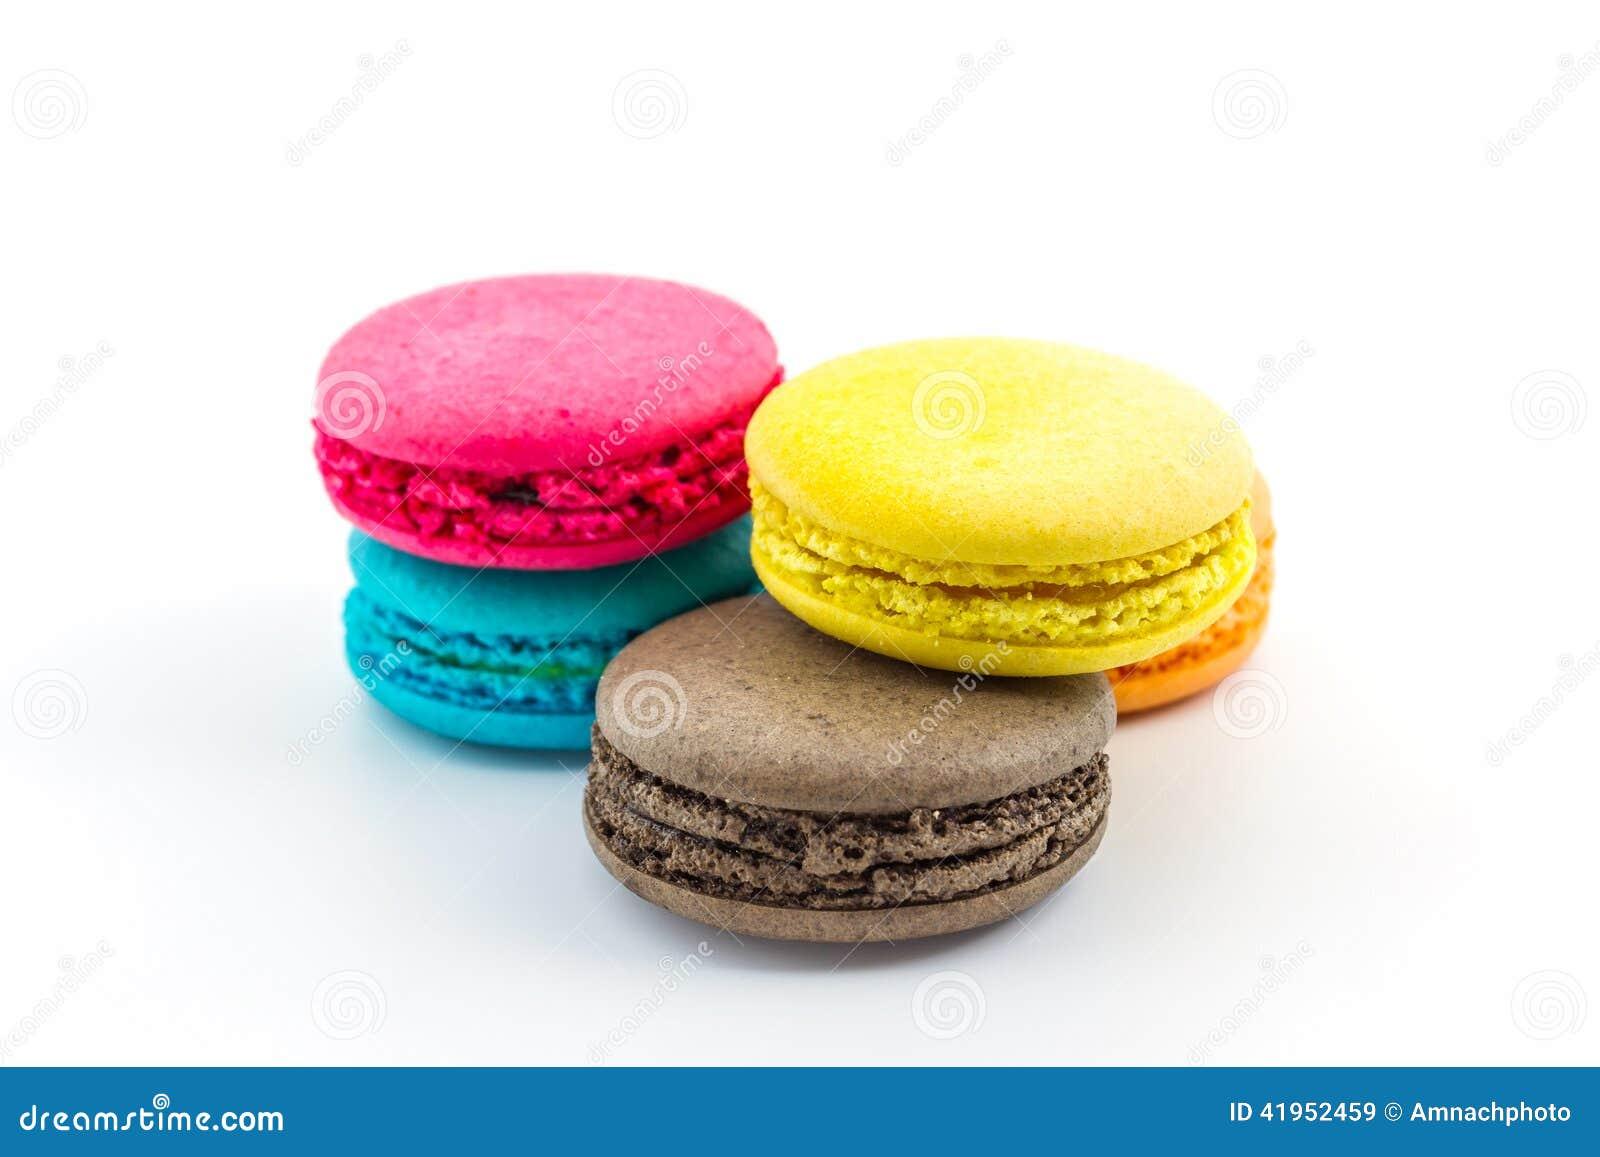 Słodcy i colourful francuscy macaroons